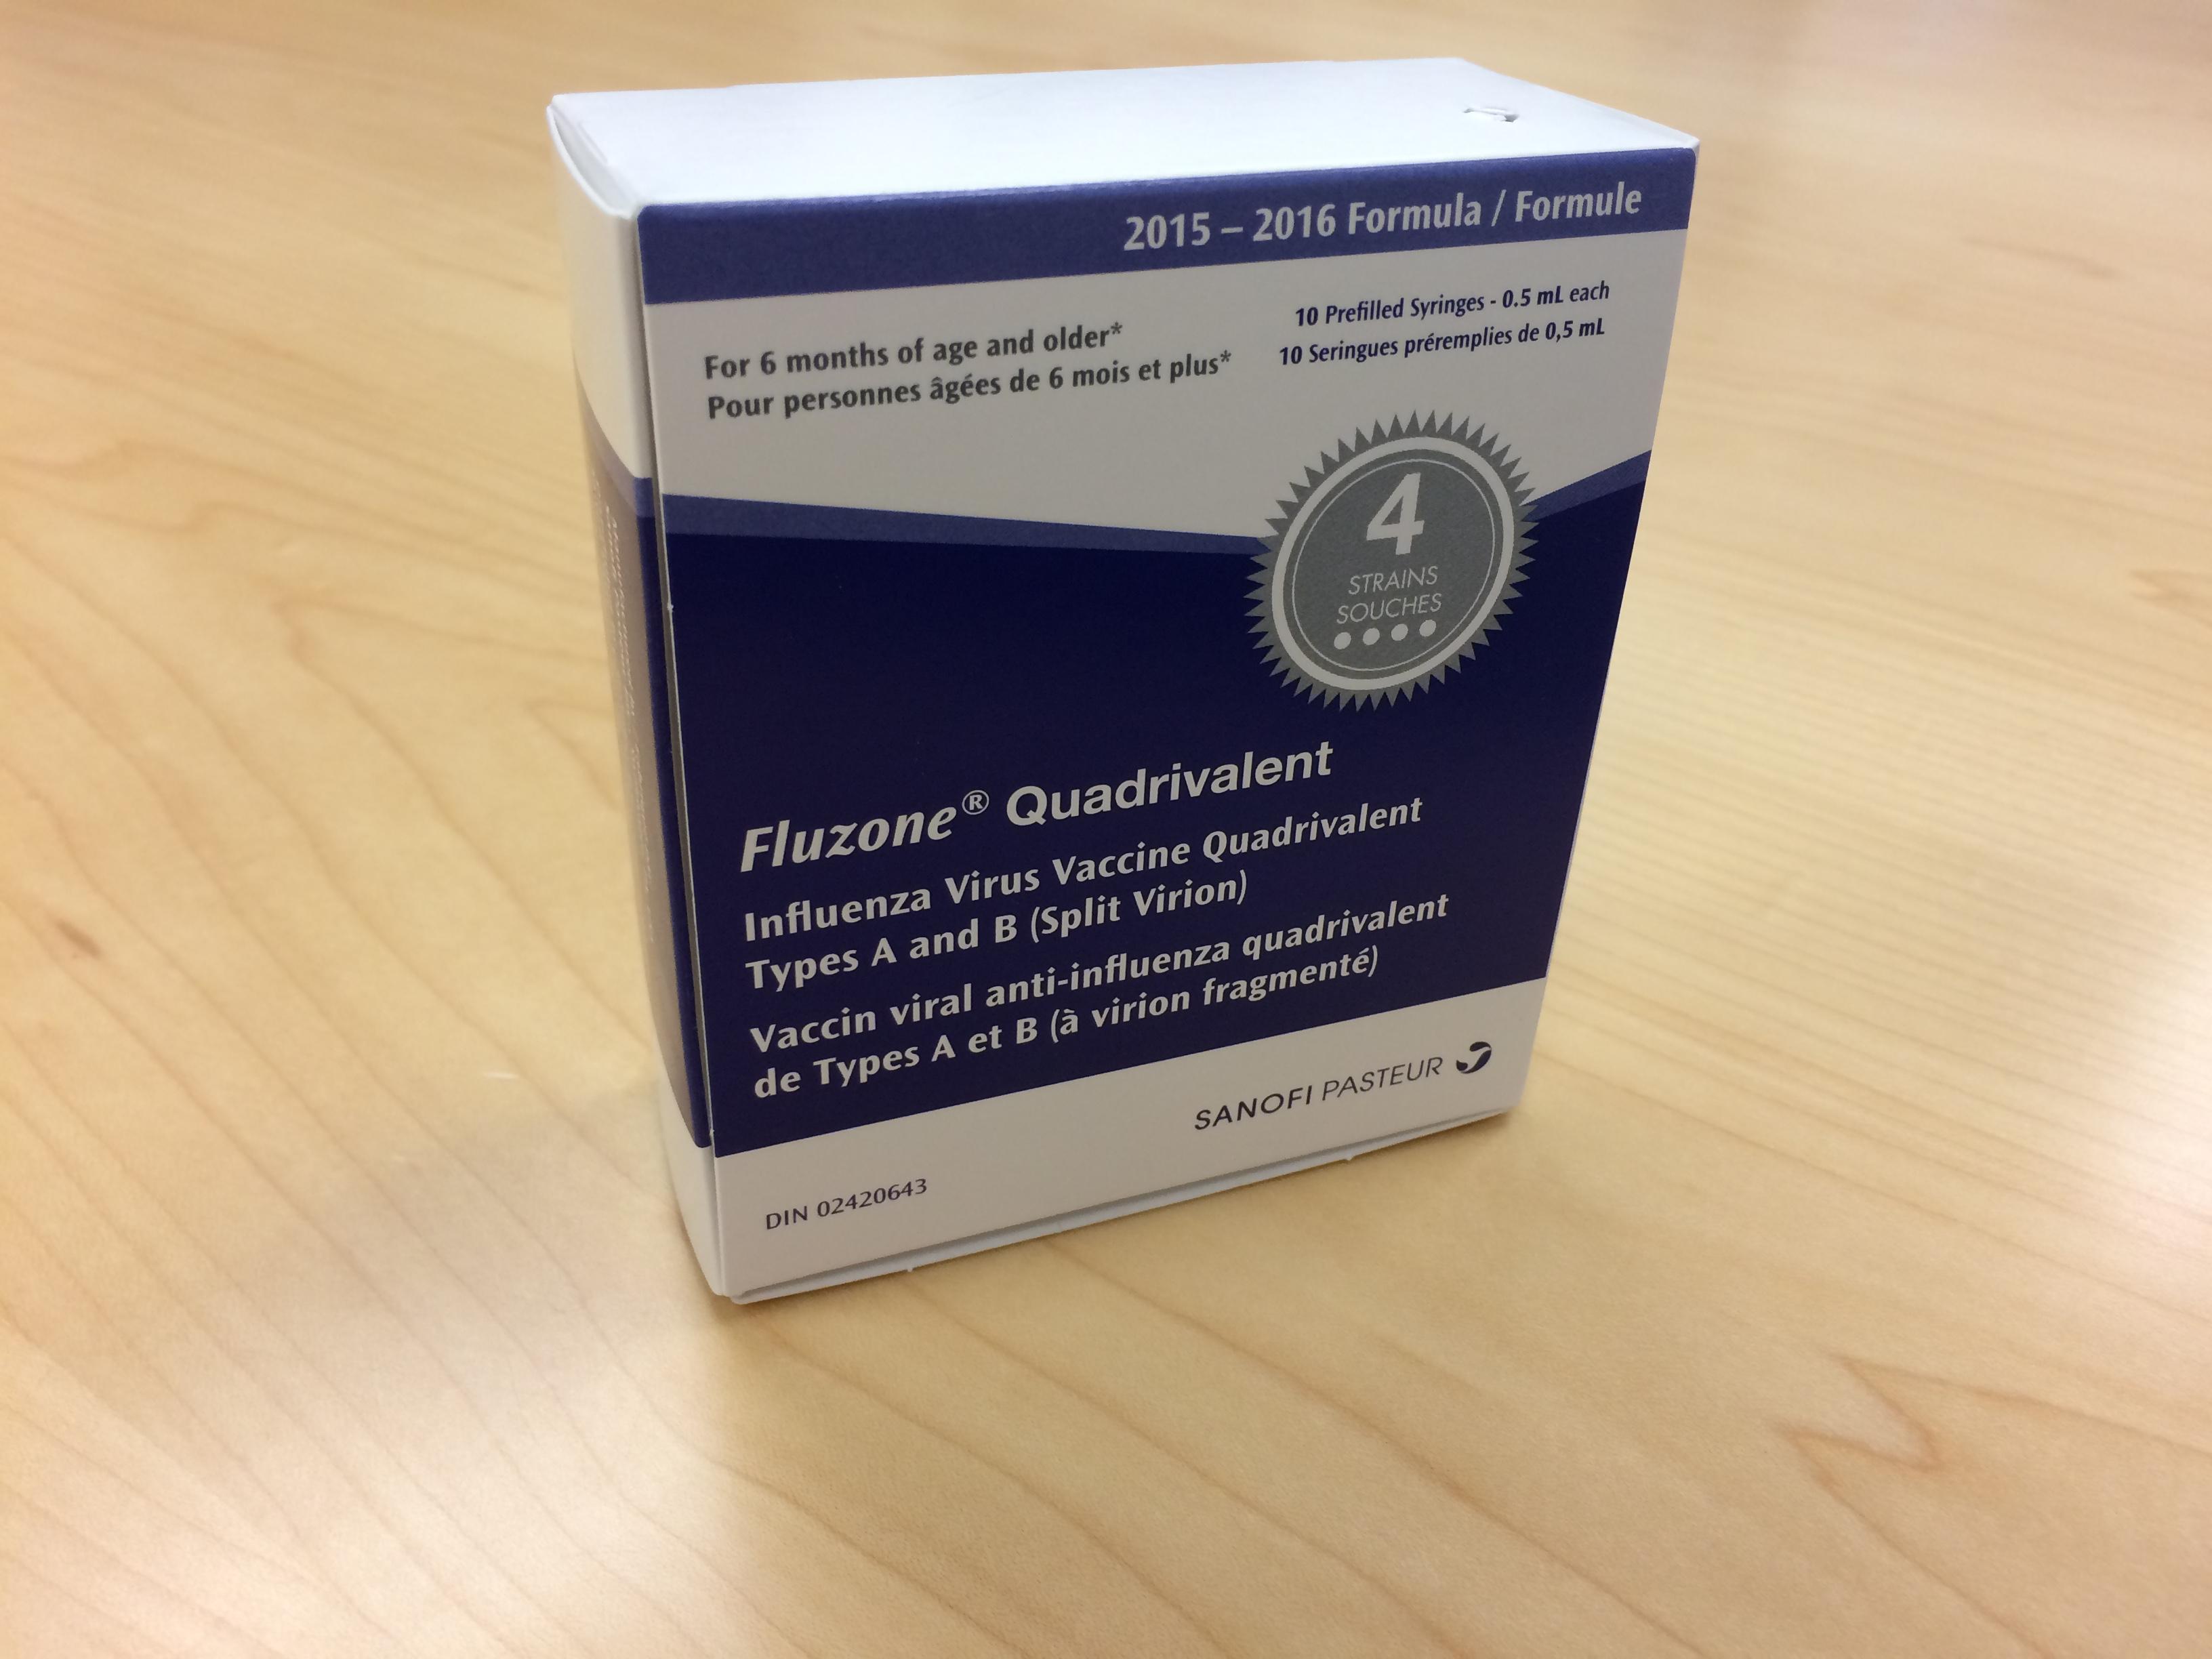 Influenza (Fluzone) Quadrivalent - Vaccine Ingredients